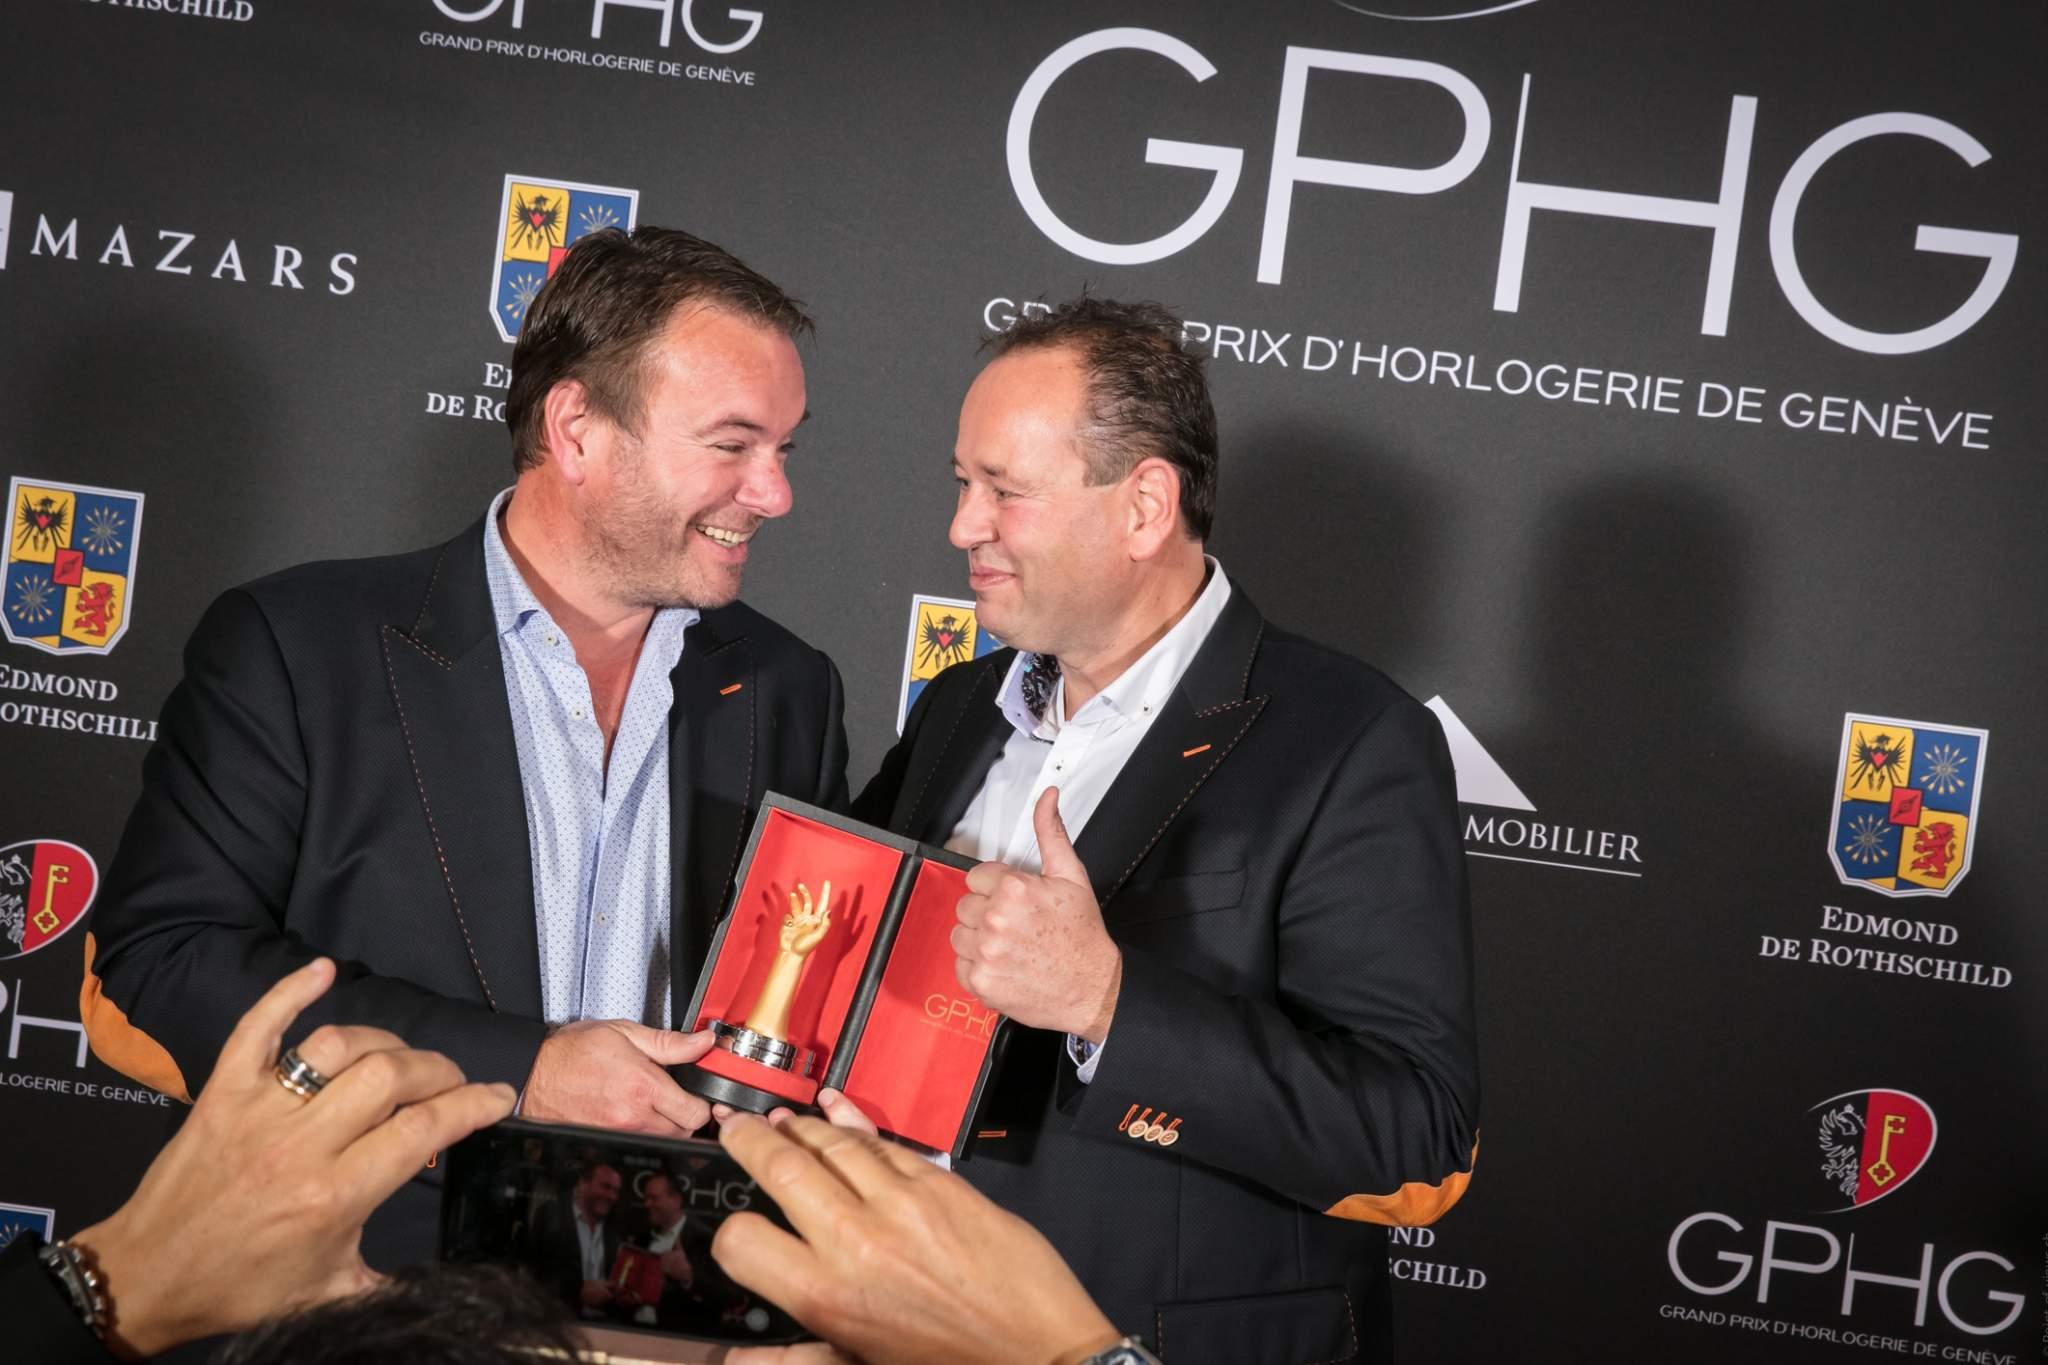 Tim and Bart Grönefeld (Co-founders of Grönefeld, winners of the Men's Wazch Prize 2016)